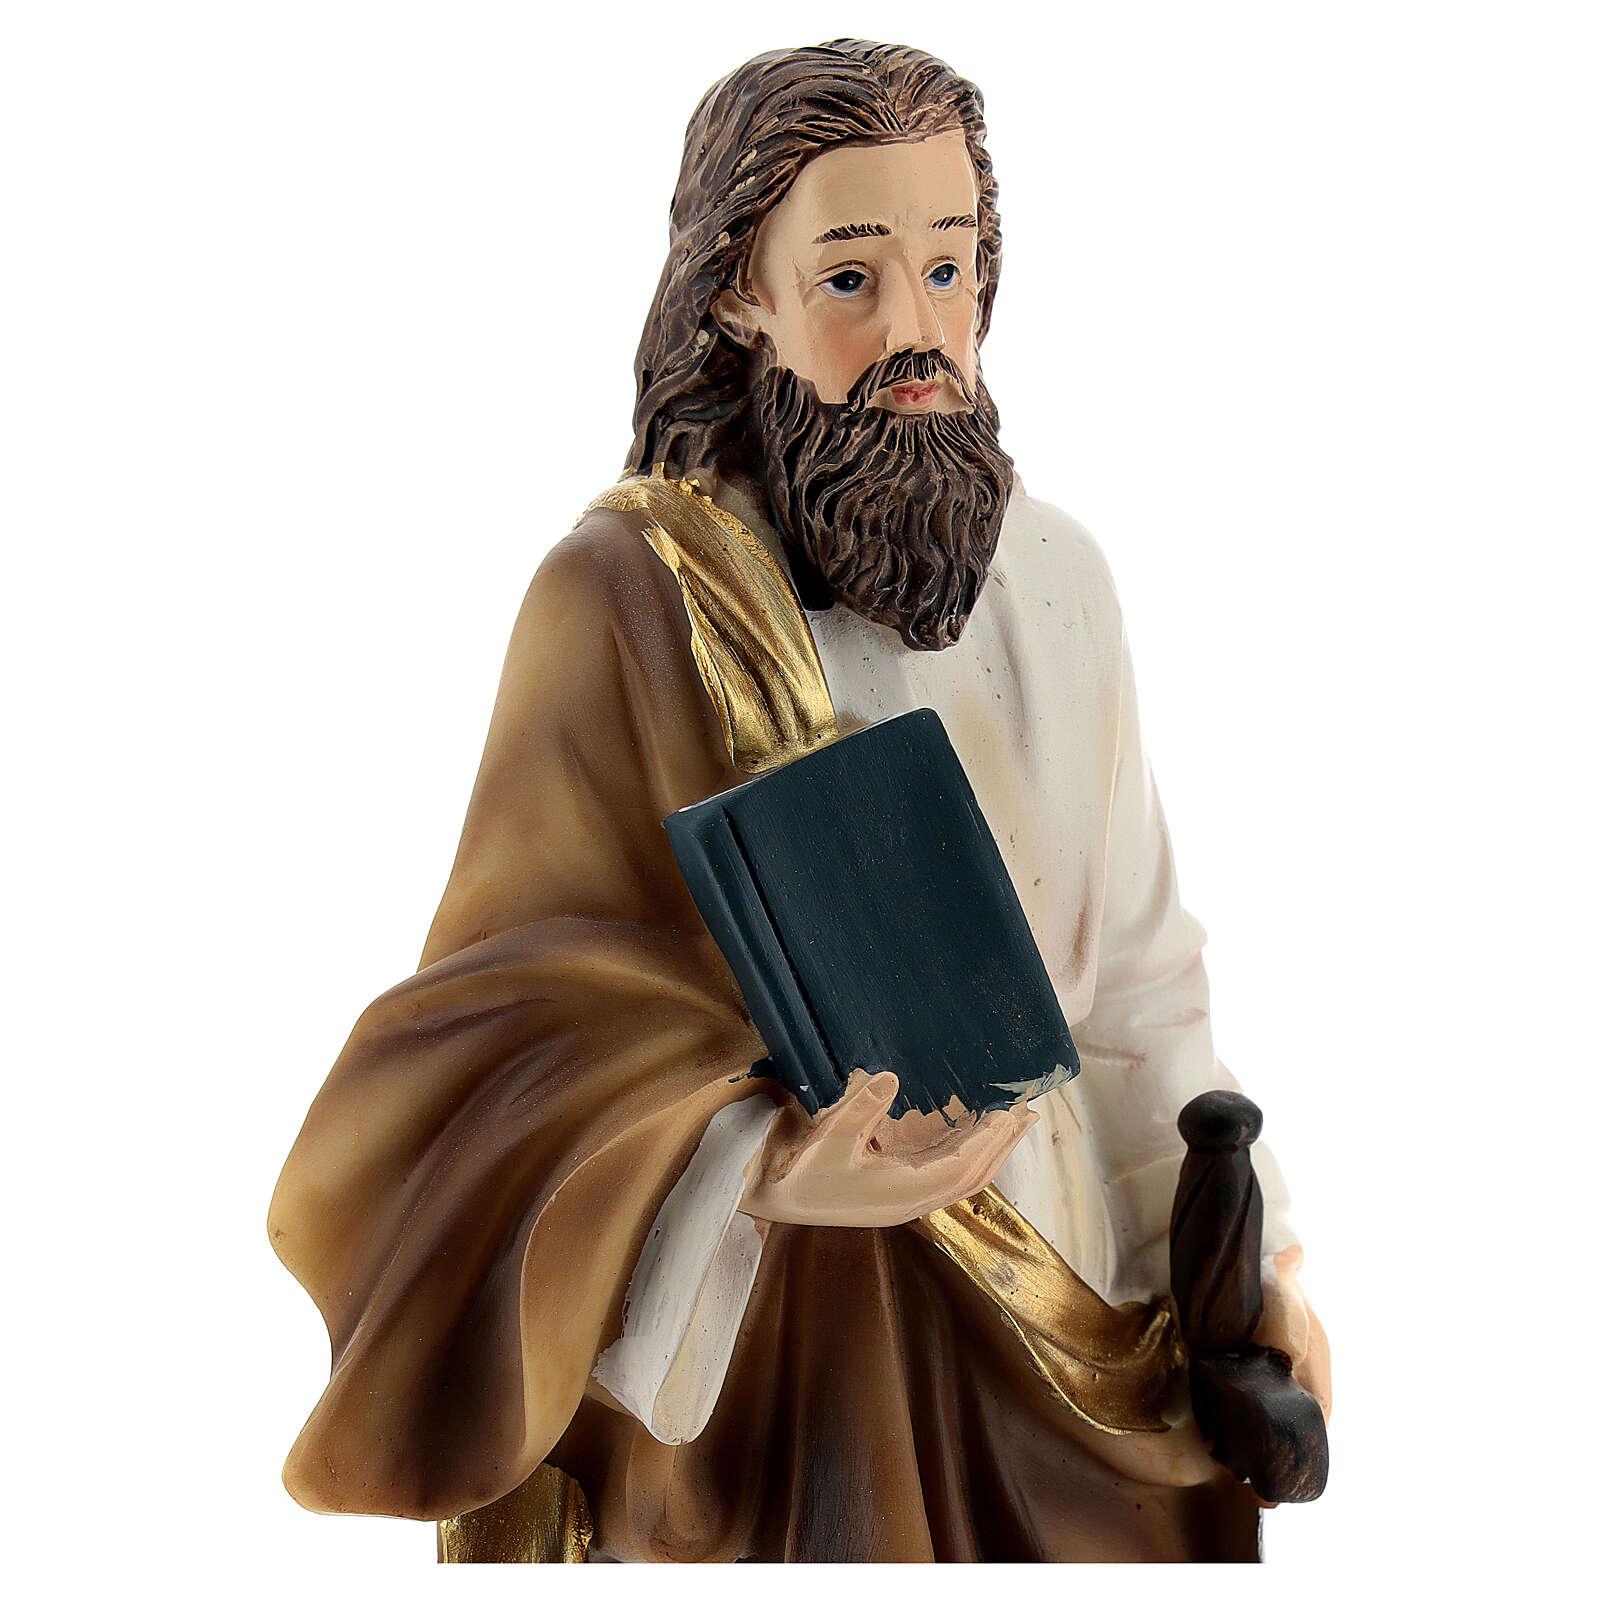 San Paolo capelli castani statua resina 21 cm 4